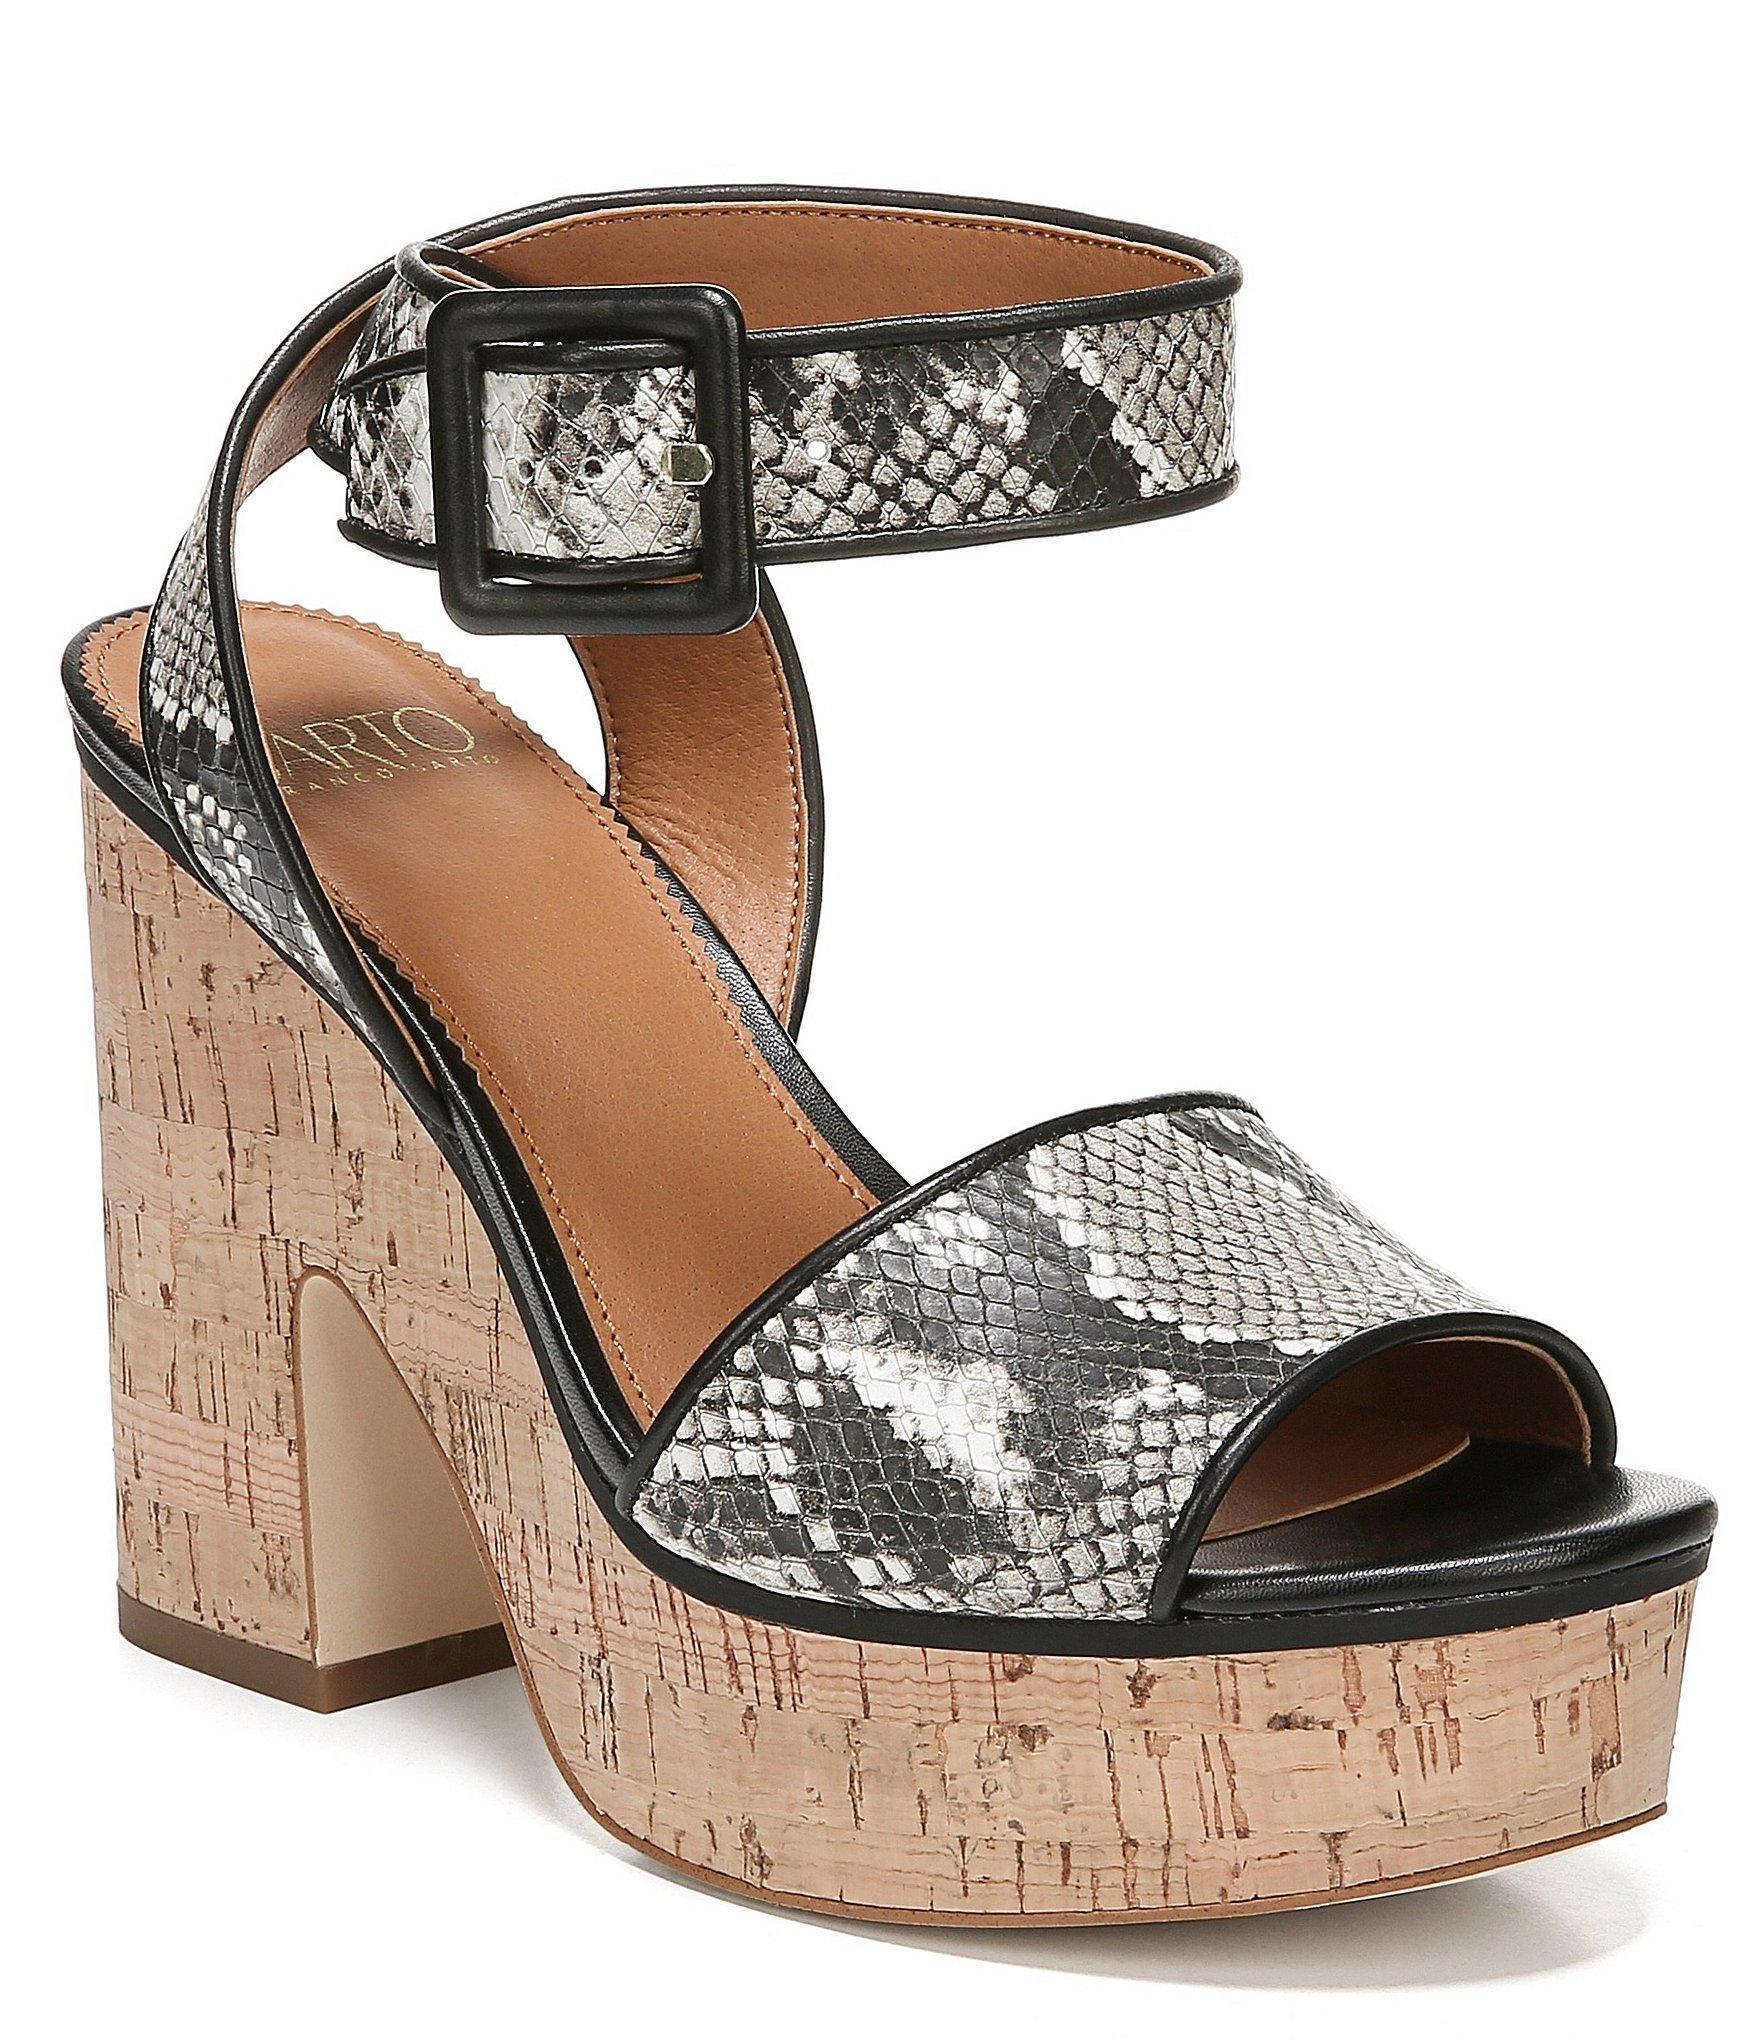 d2c50181a30 Franco Sarto. Women s Black Sarto By Franny Snake Print Cork Block Heel  Sandals